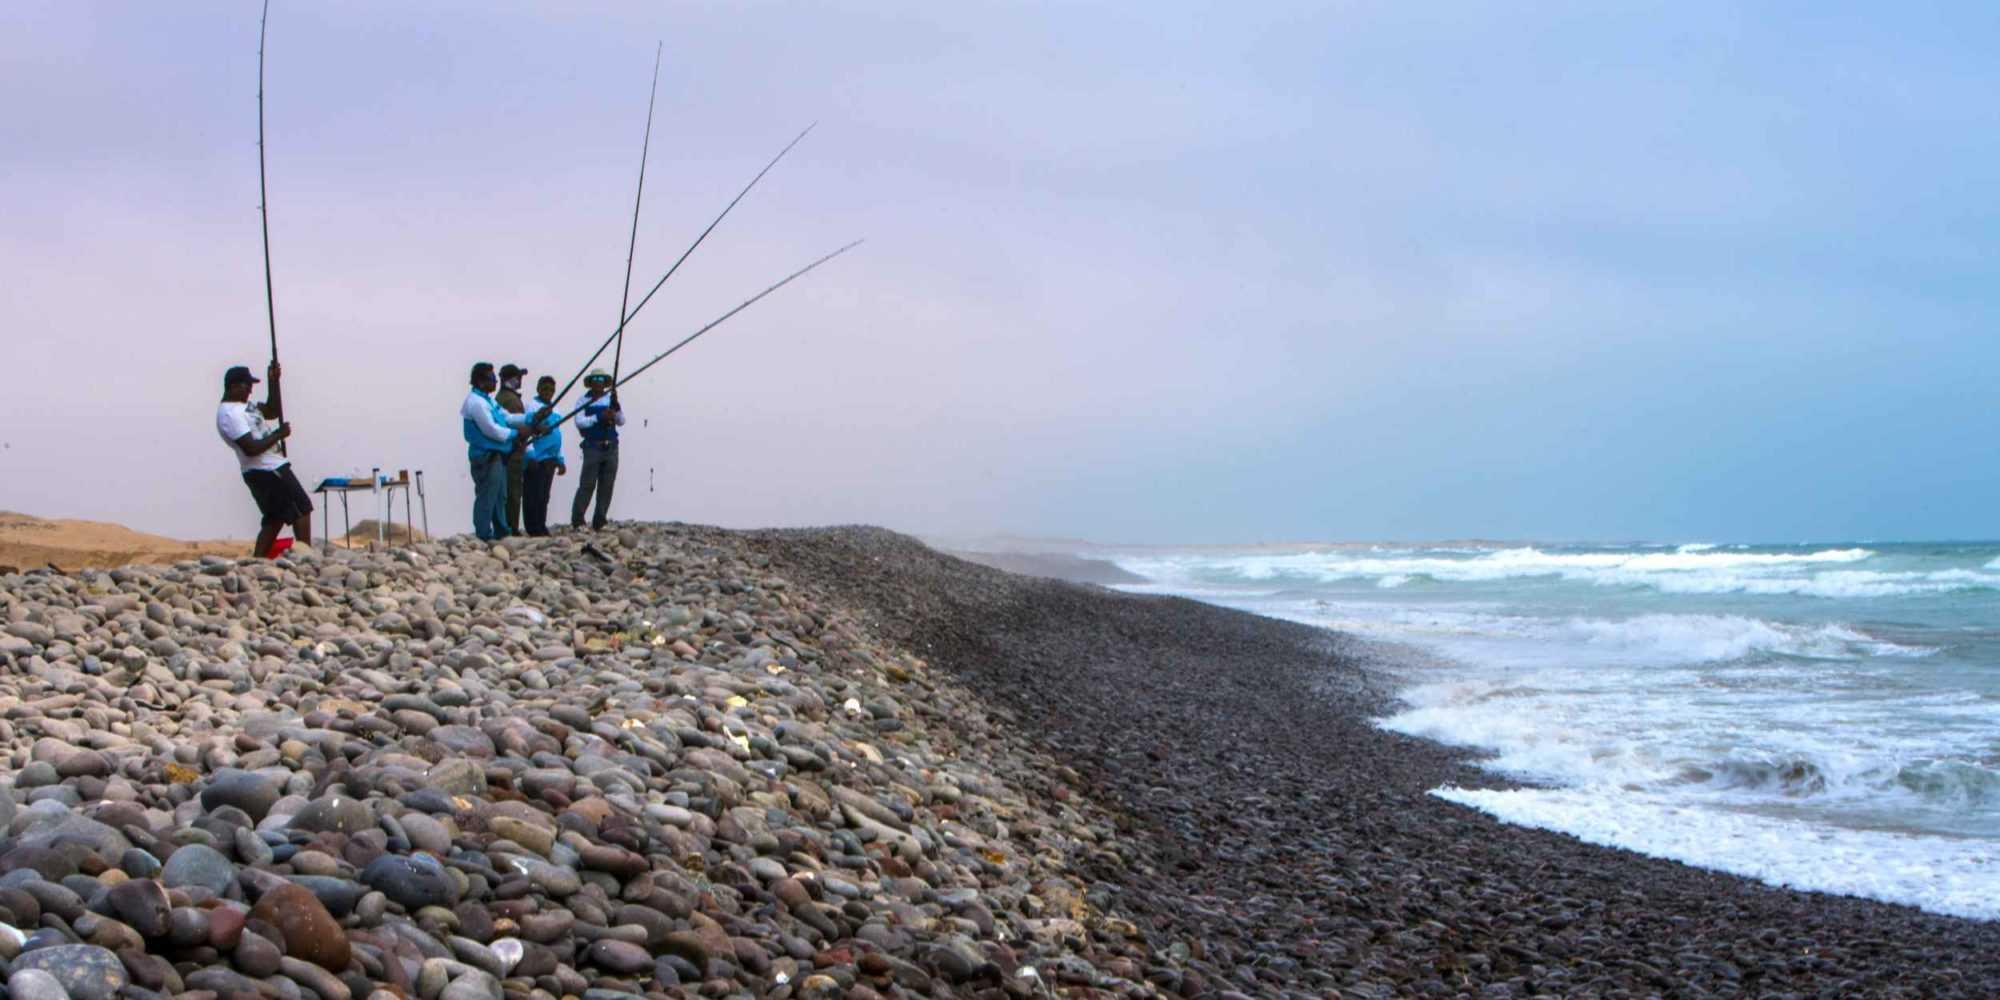 Terrace Bay Fishing 08 © NWR 2018